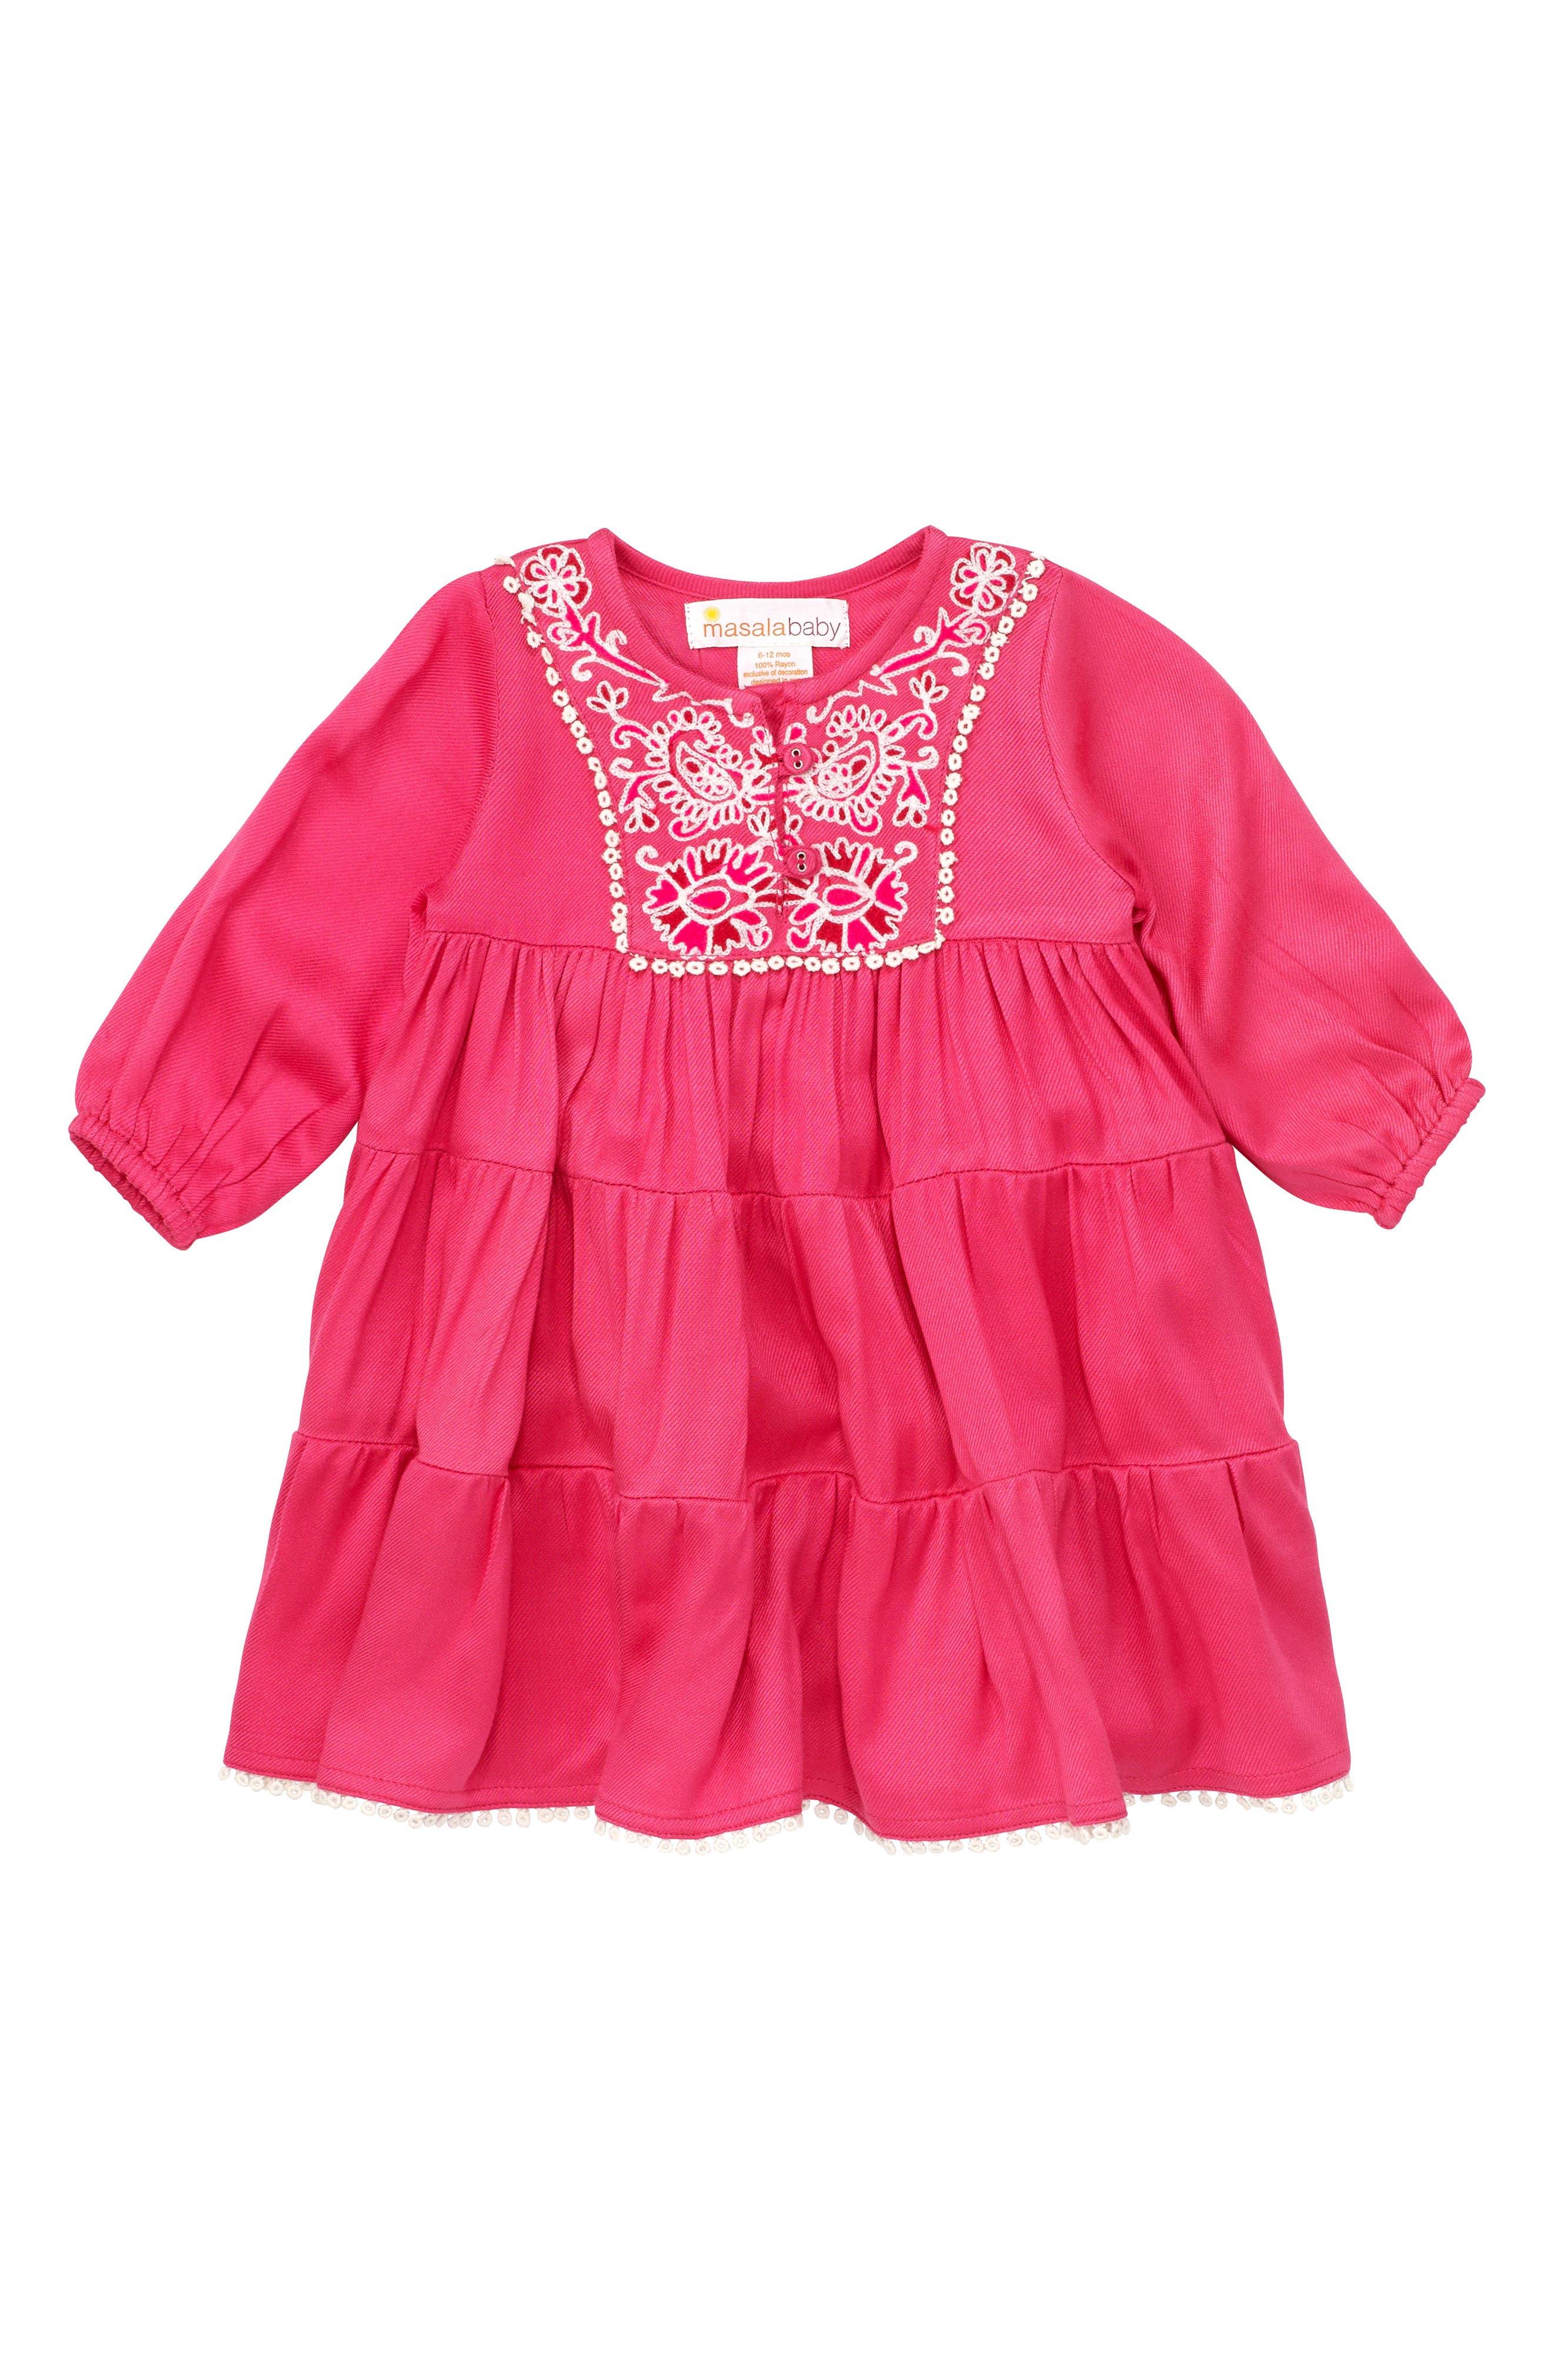 Alternate Image 1 Selected - Masalababy Gypsy Rose Dress (Baby Girls)